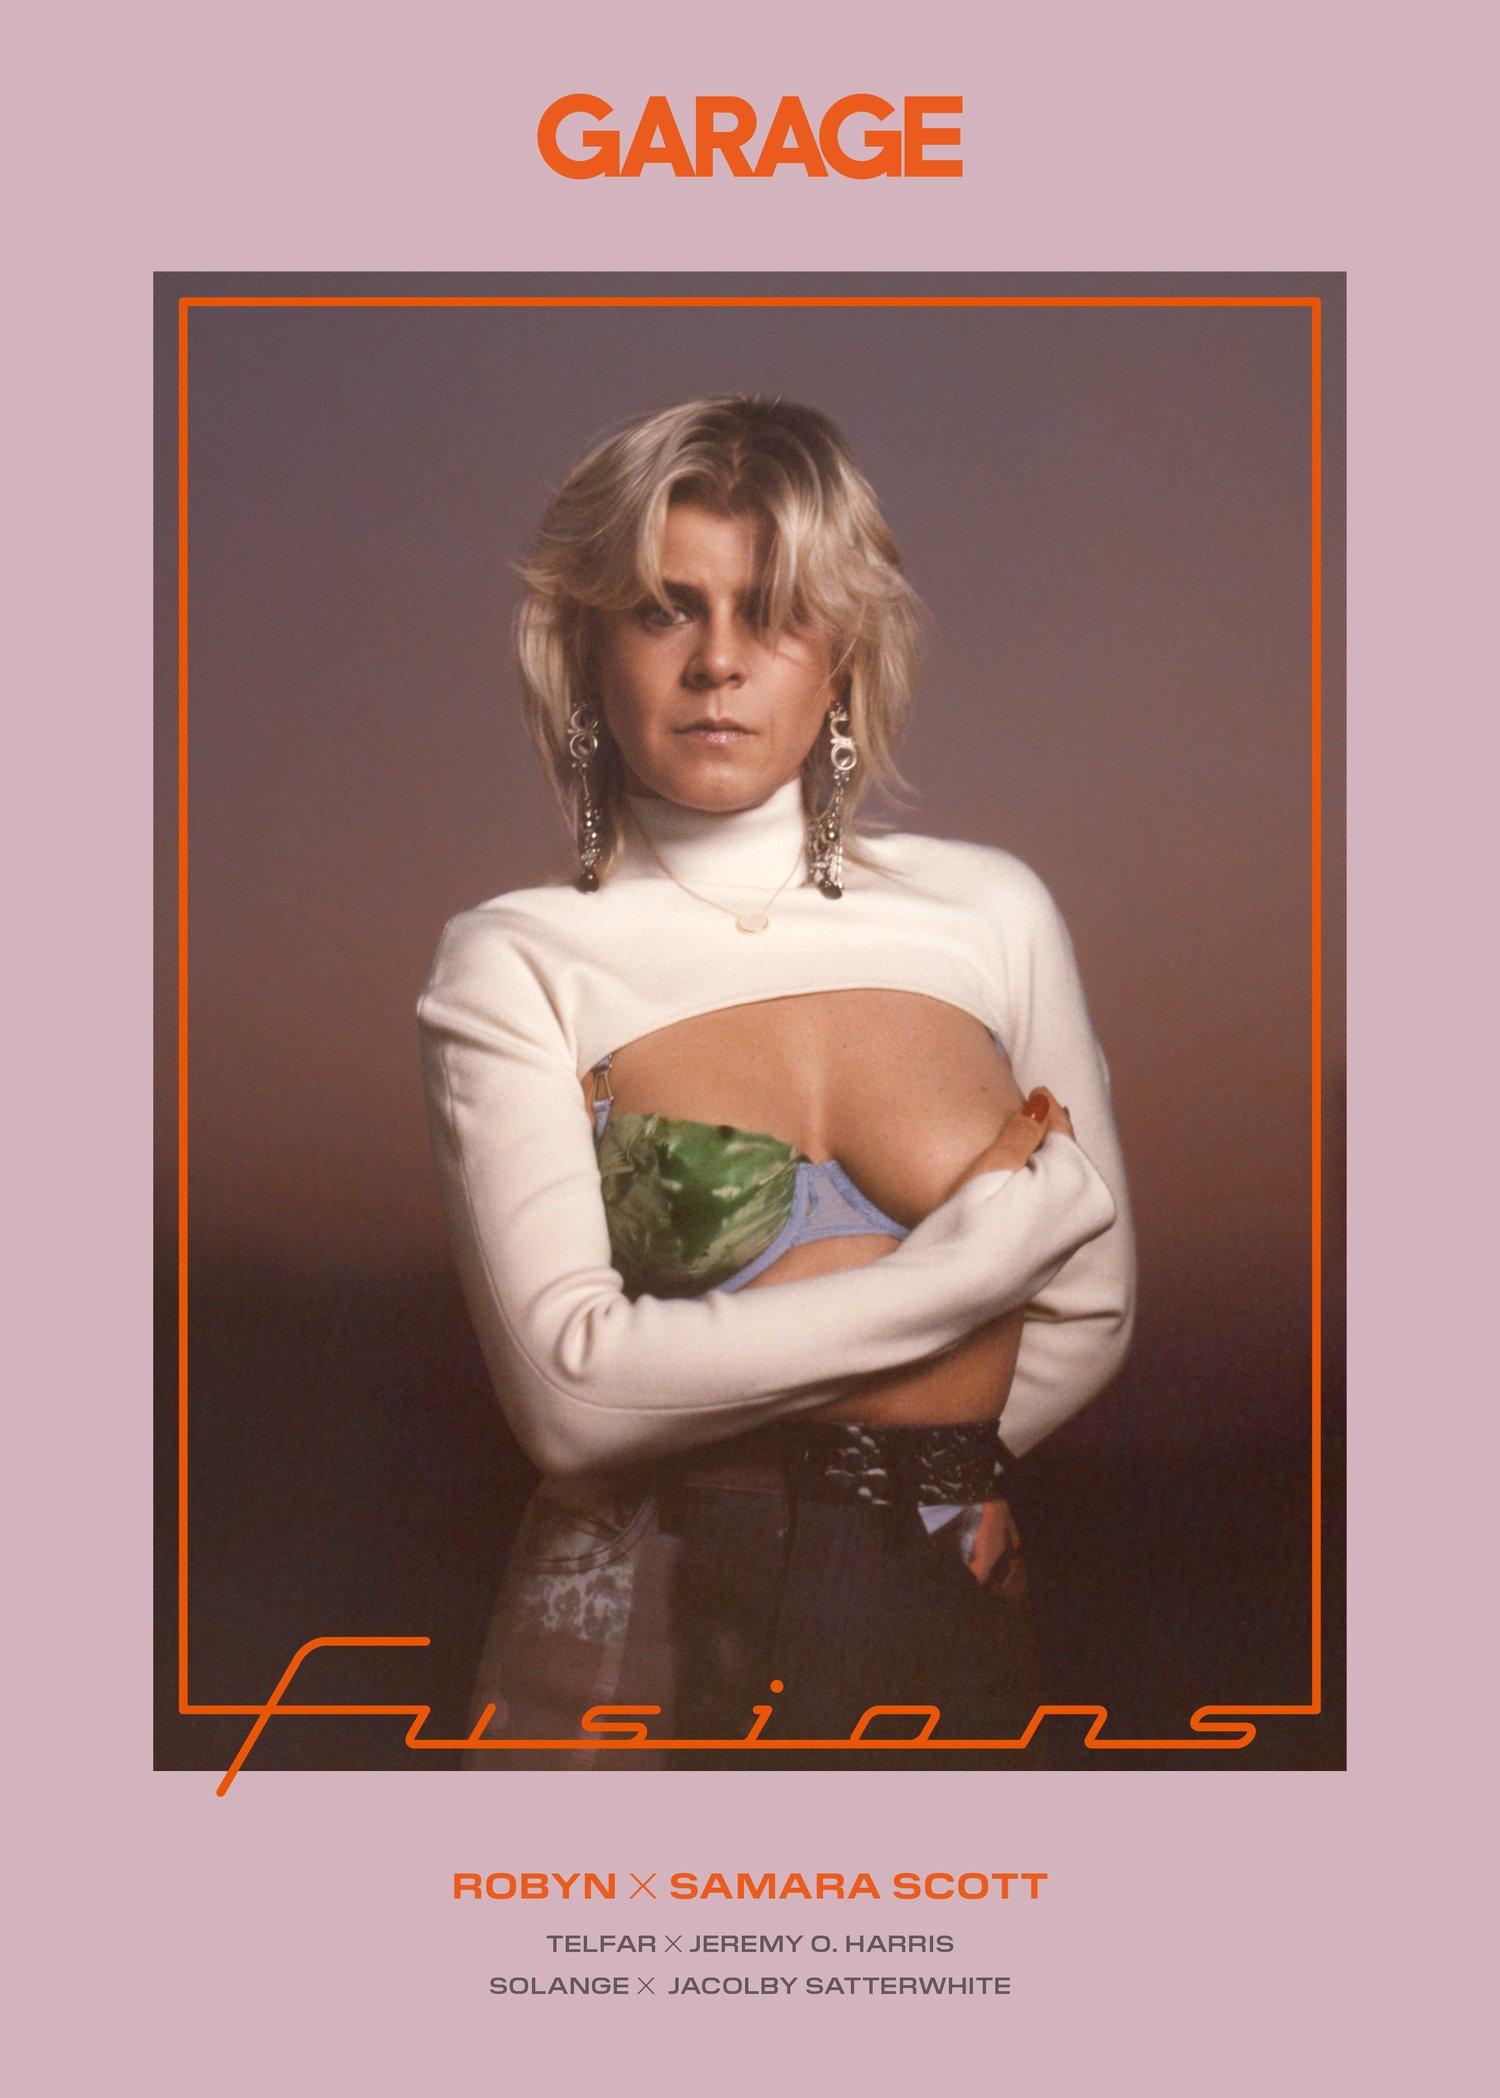 Image of GARAGE Issue 17: FUSIONS - Robyn x Samara Scott